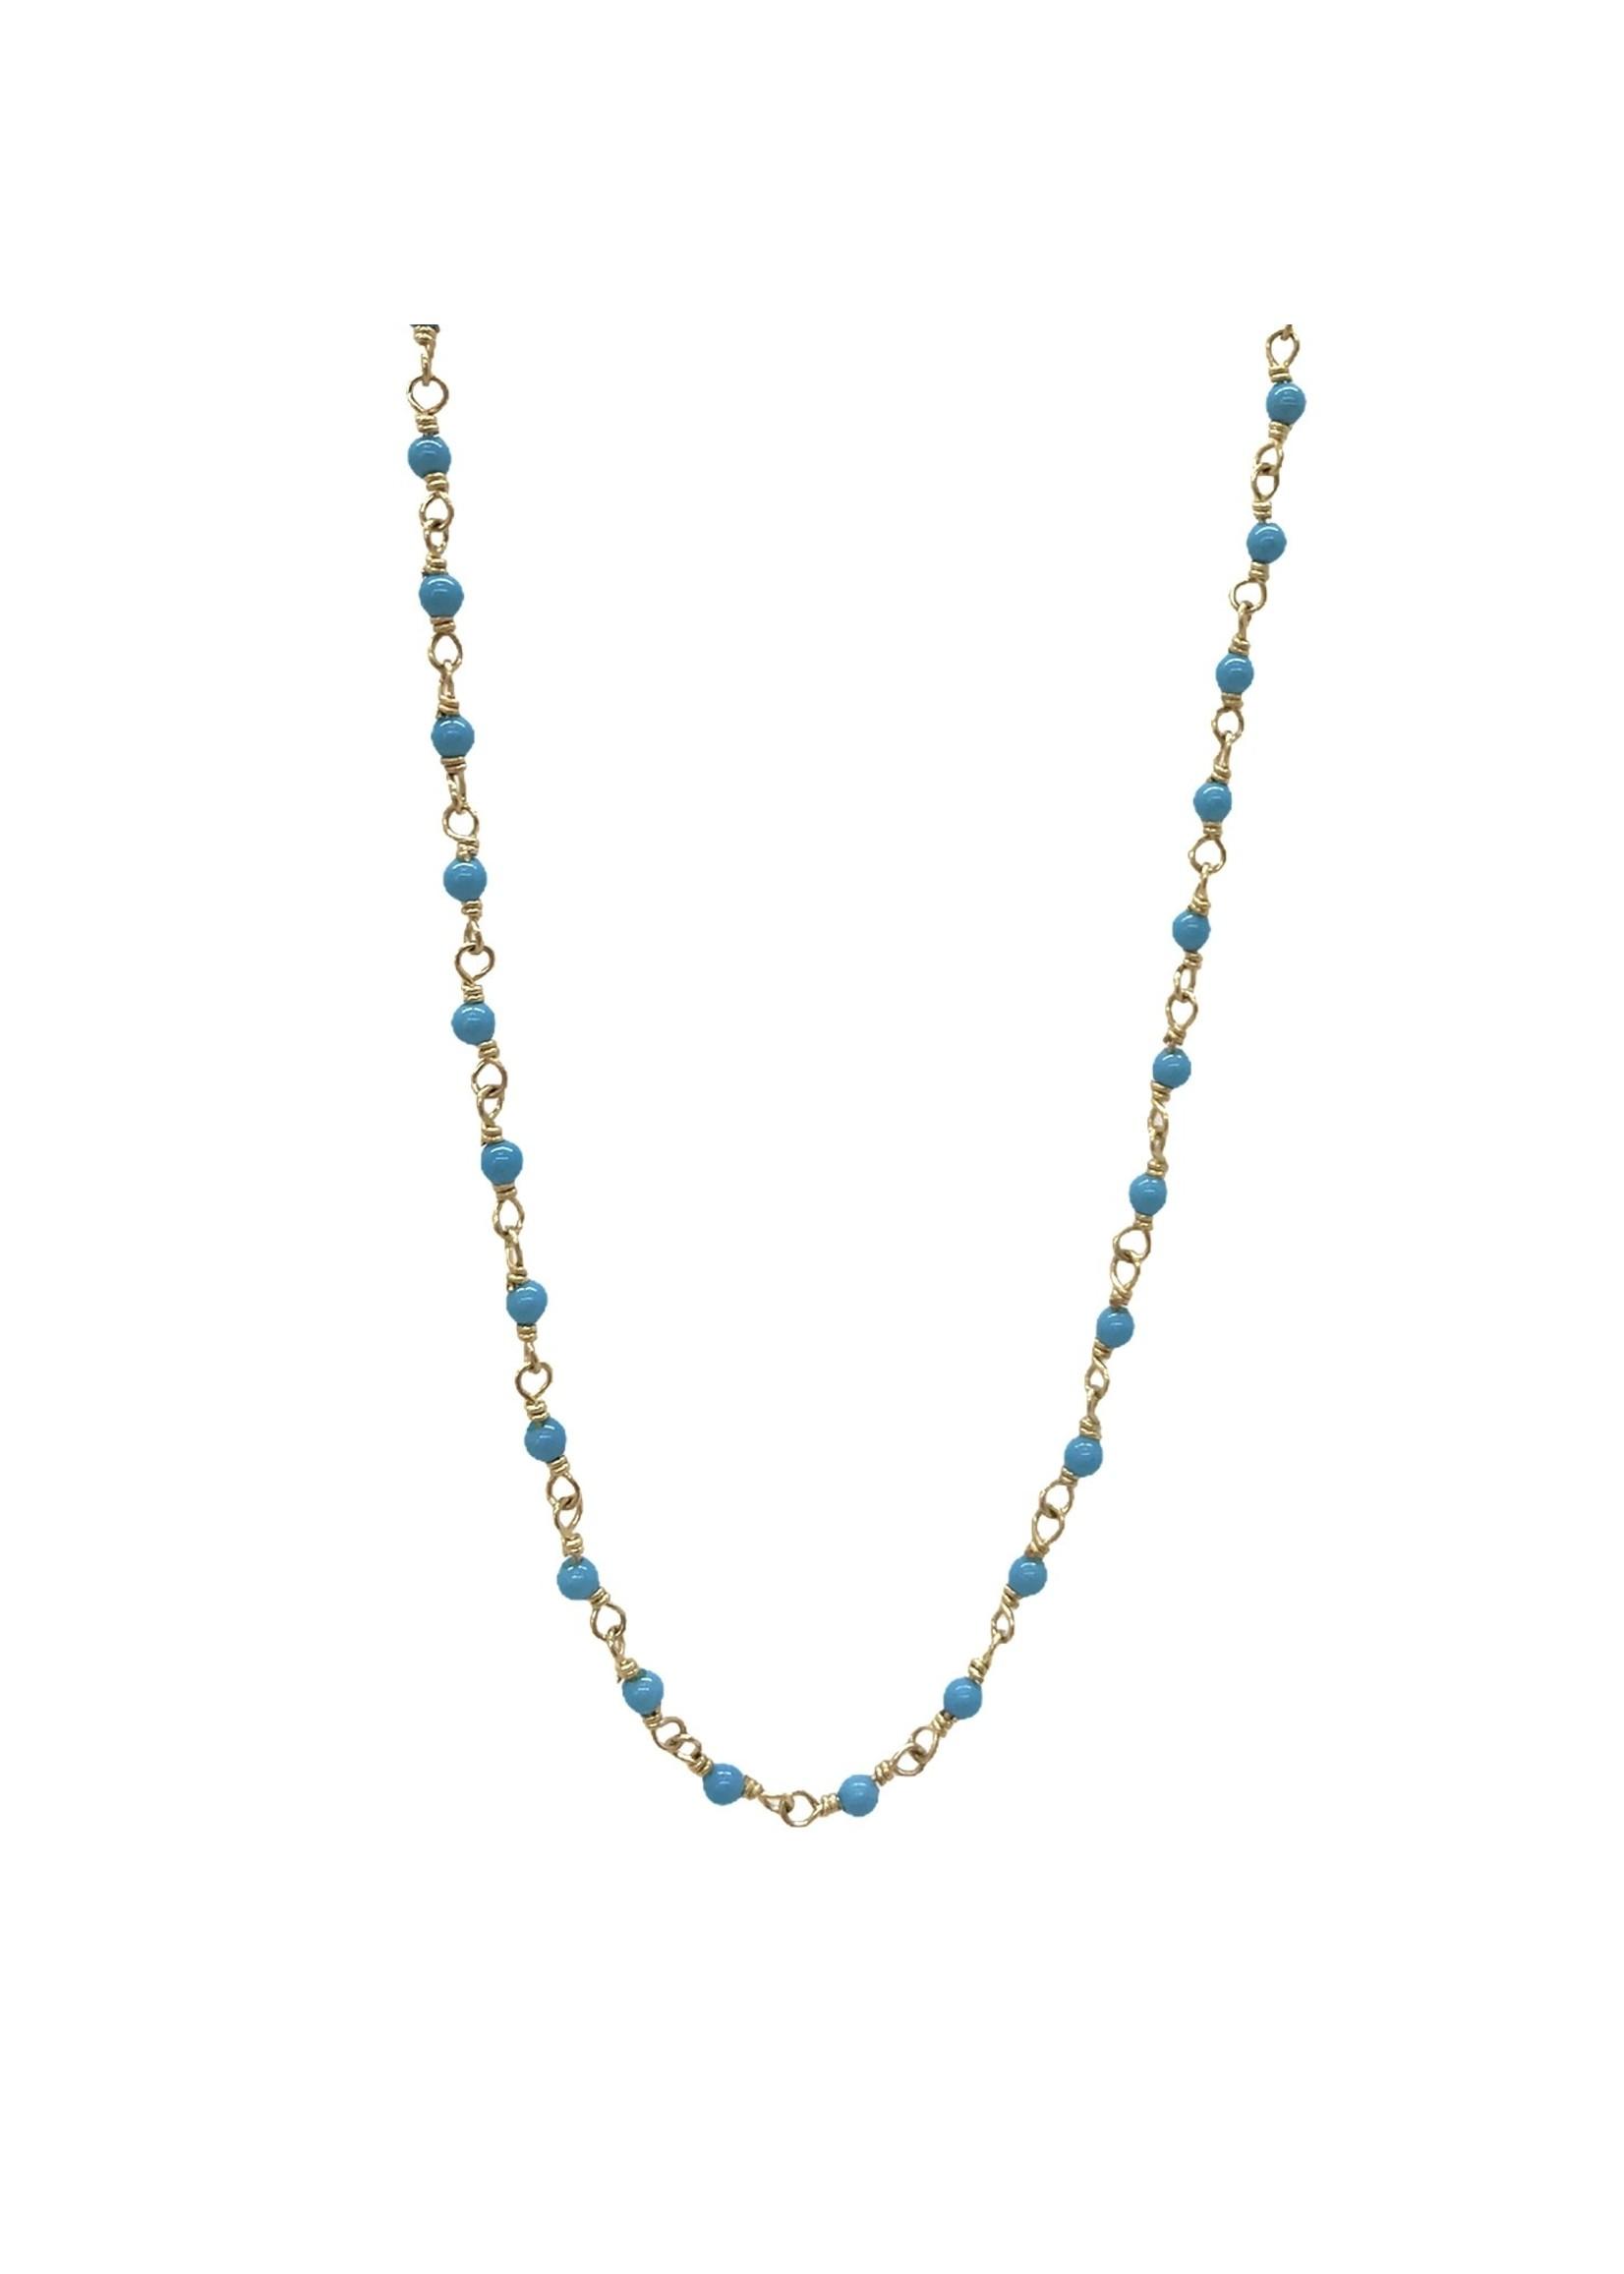 Jill Alberts Bead Necklace